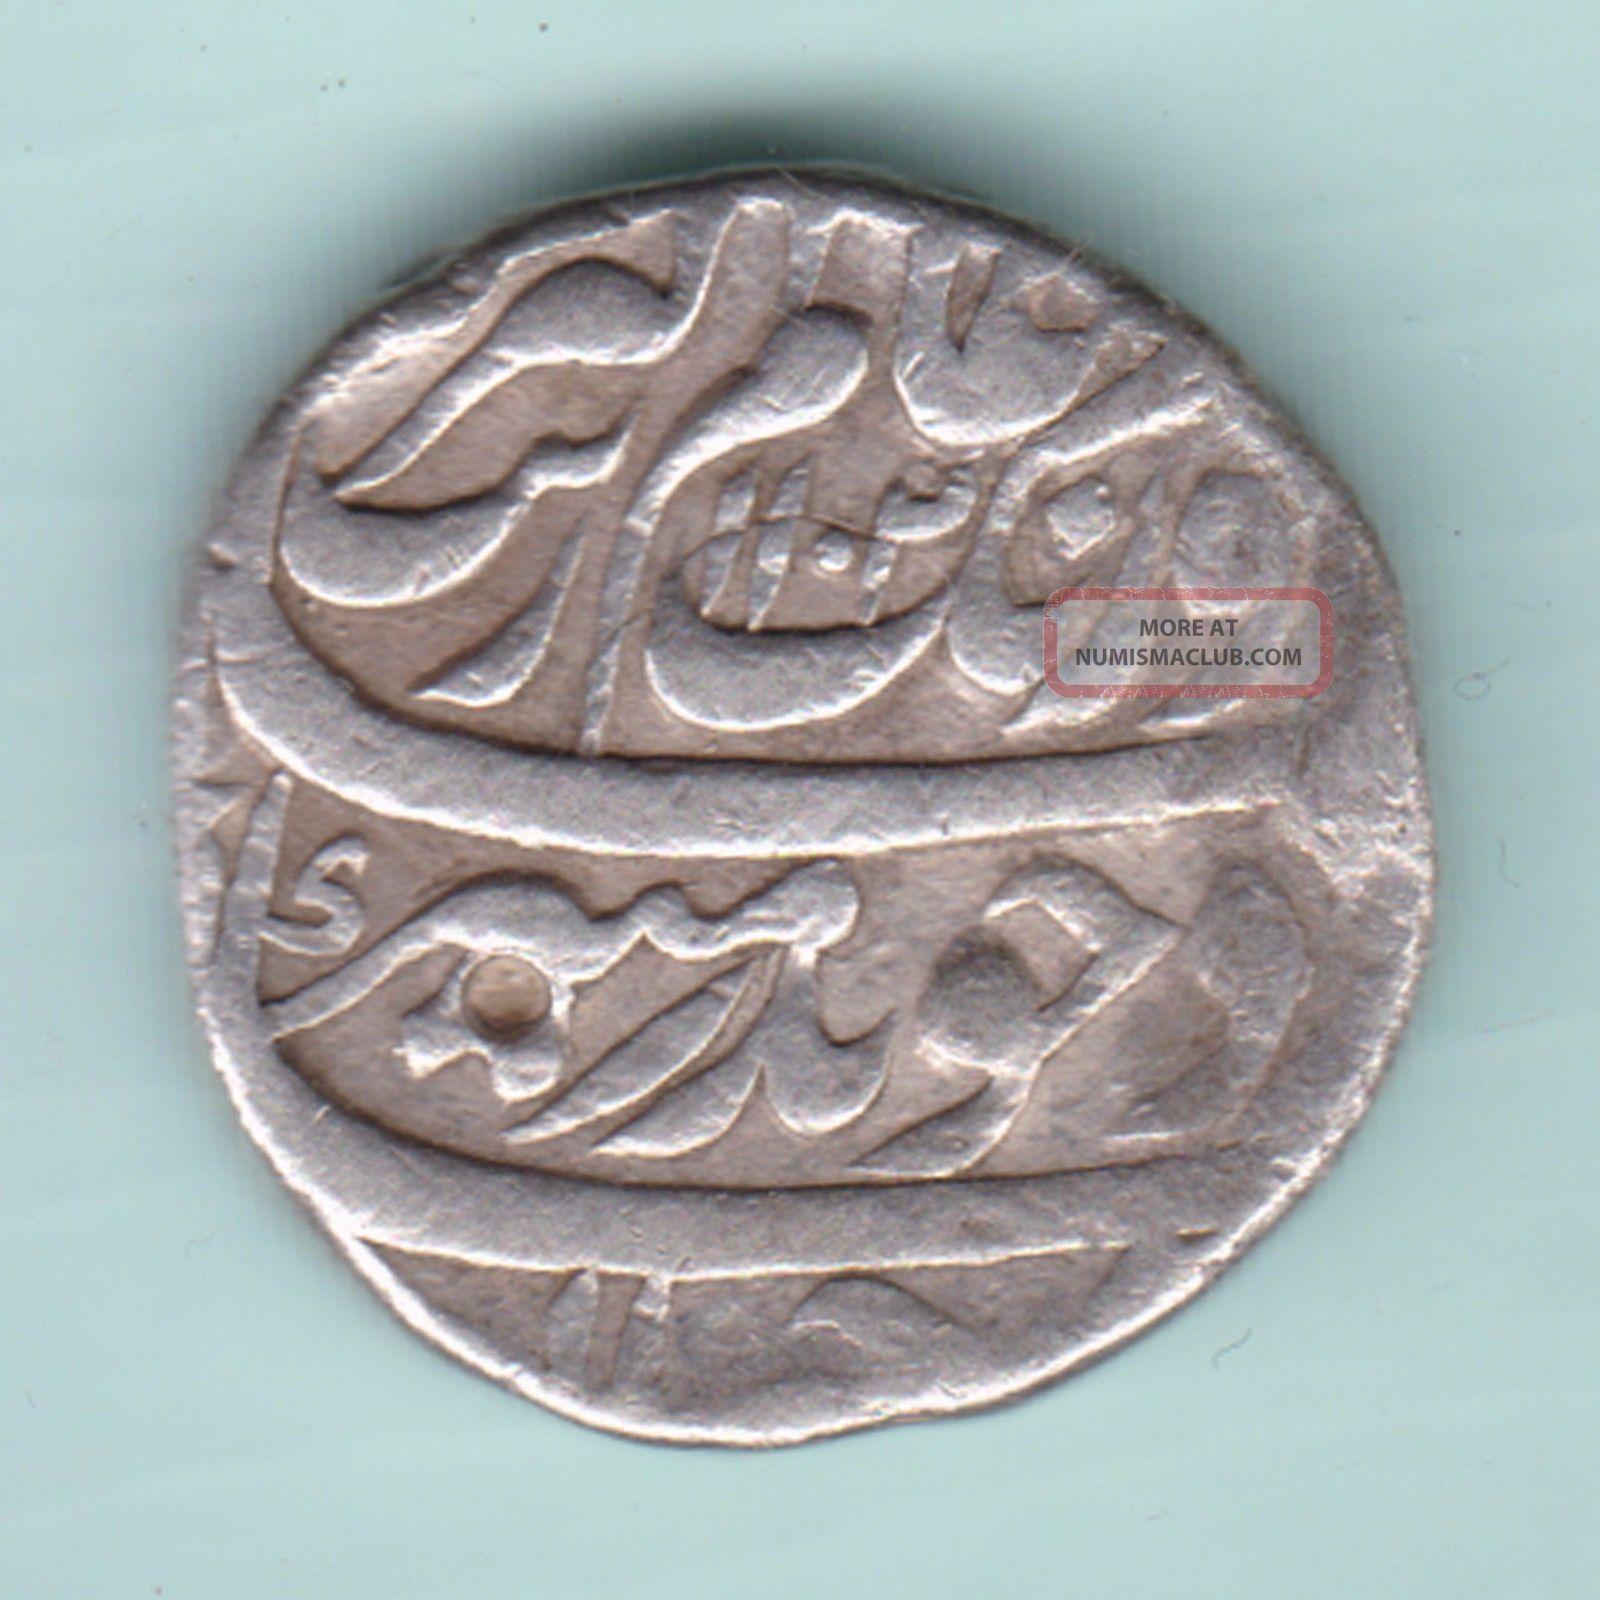 Mughal India - Ah 1102 - Aurangzeb Alamgir - Shahjahanabad - One Rupee - Rare India photo